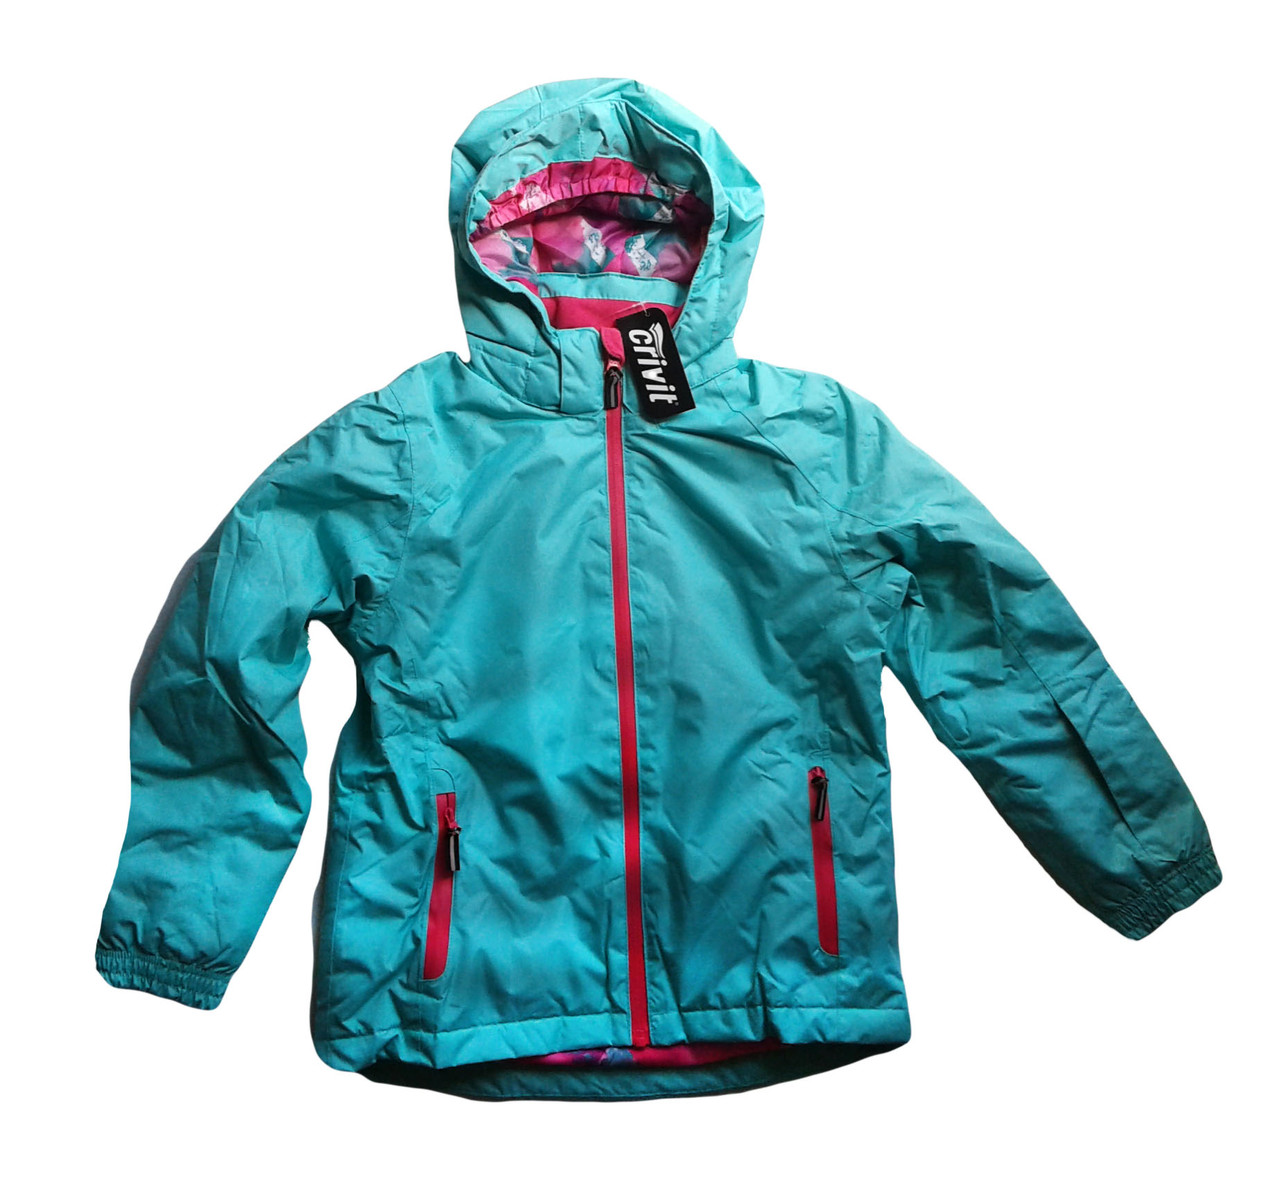 Куртка для девочки, Crivit, размеры 134/140,146/152, арт. Л-423